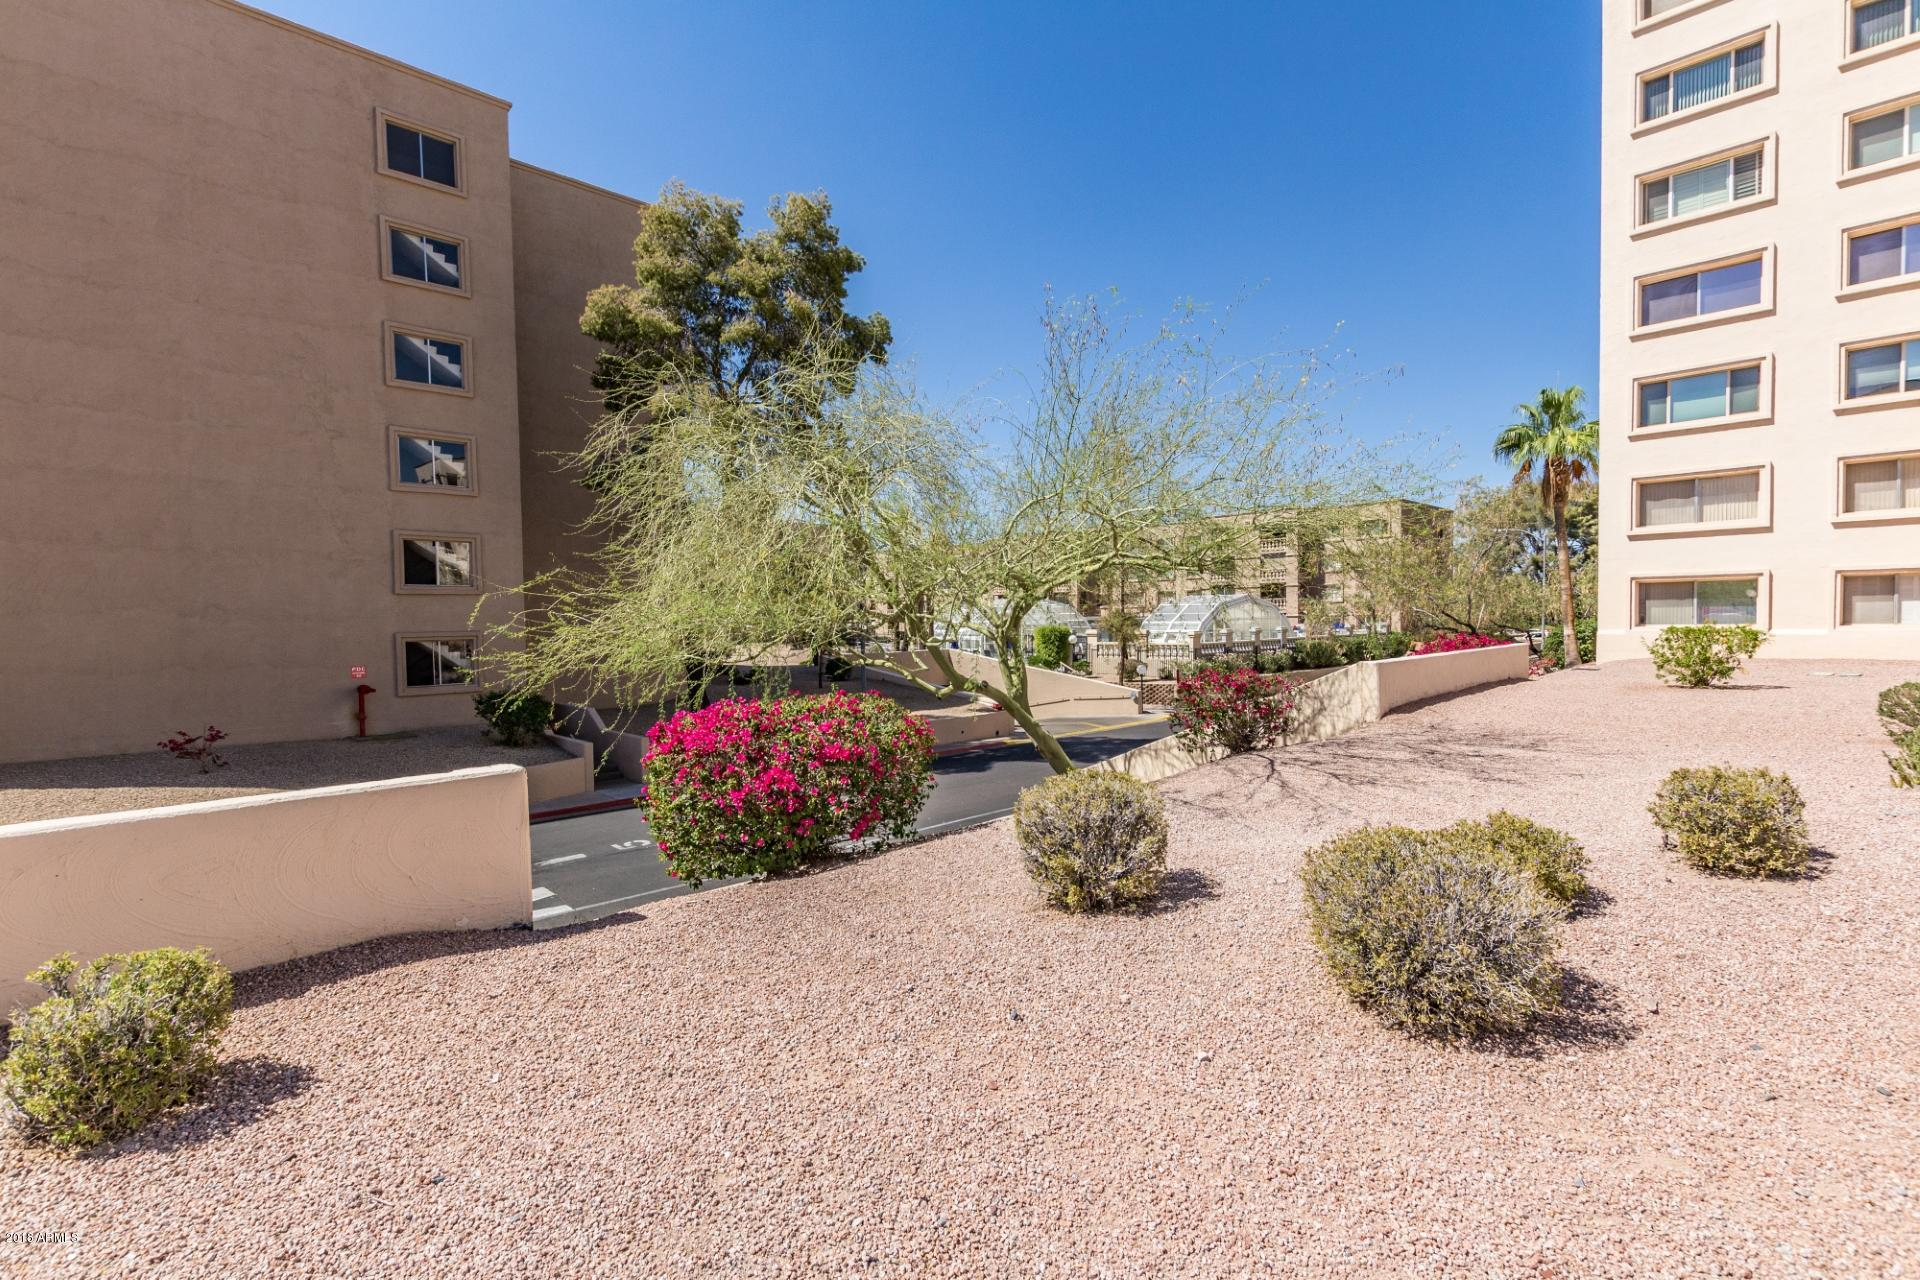 MLS 5771451 7930 E CAMELBACK Road Unit 703 Building 25, Scottsdale, AZ 85251 Scottsdale AZ High Rise